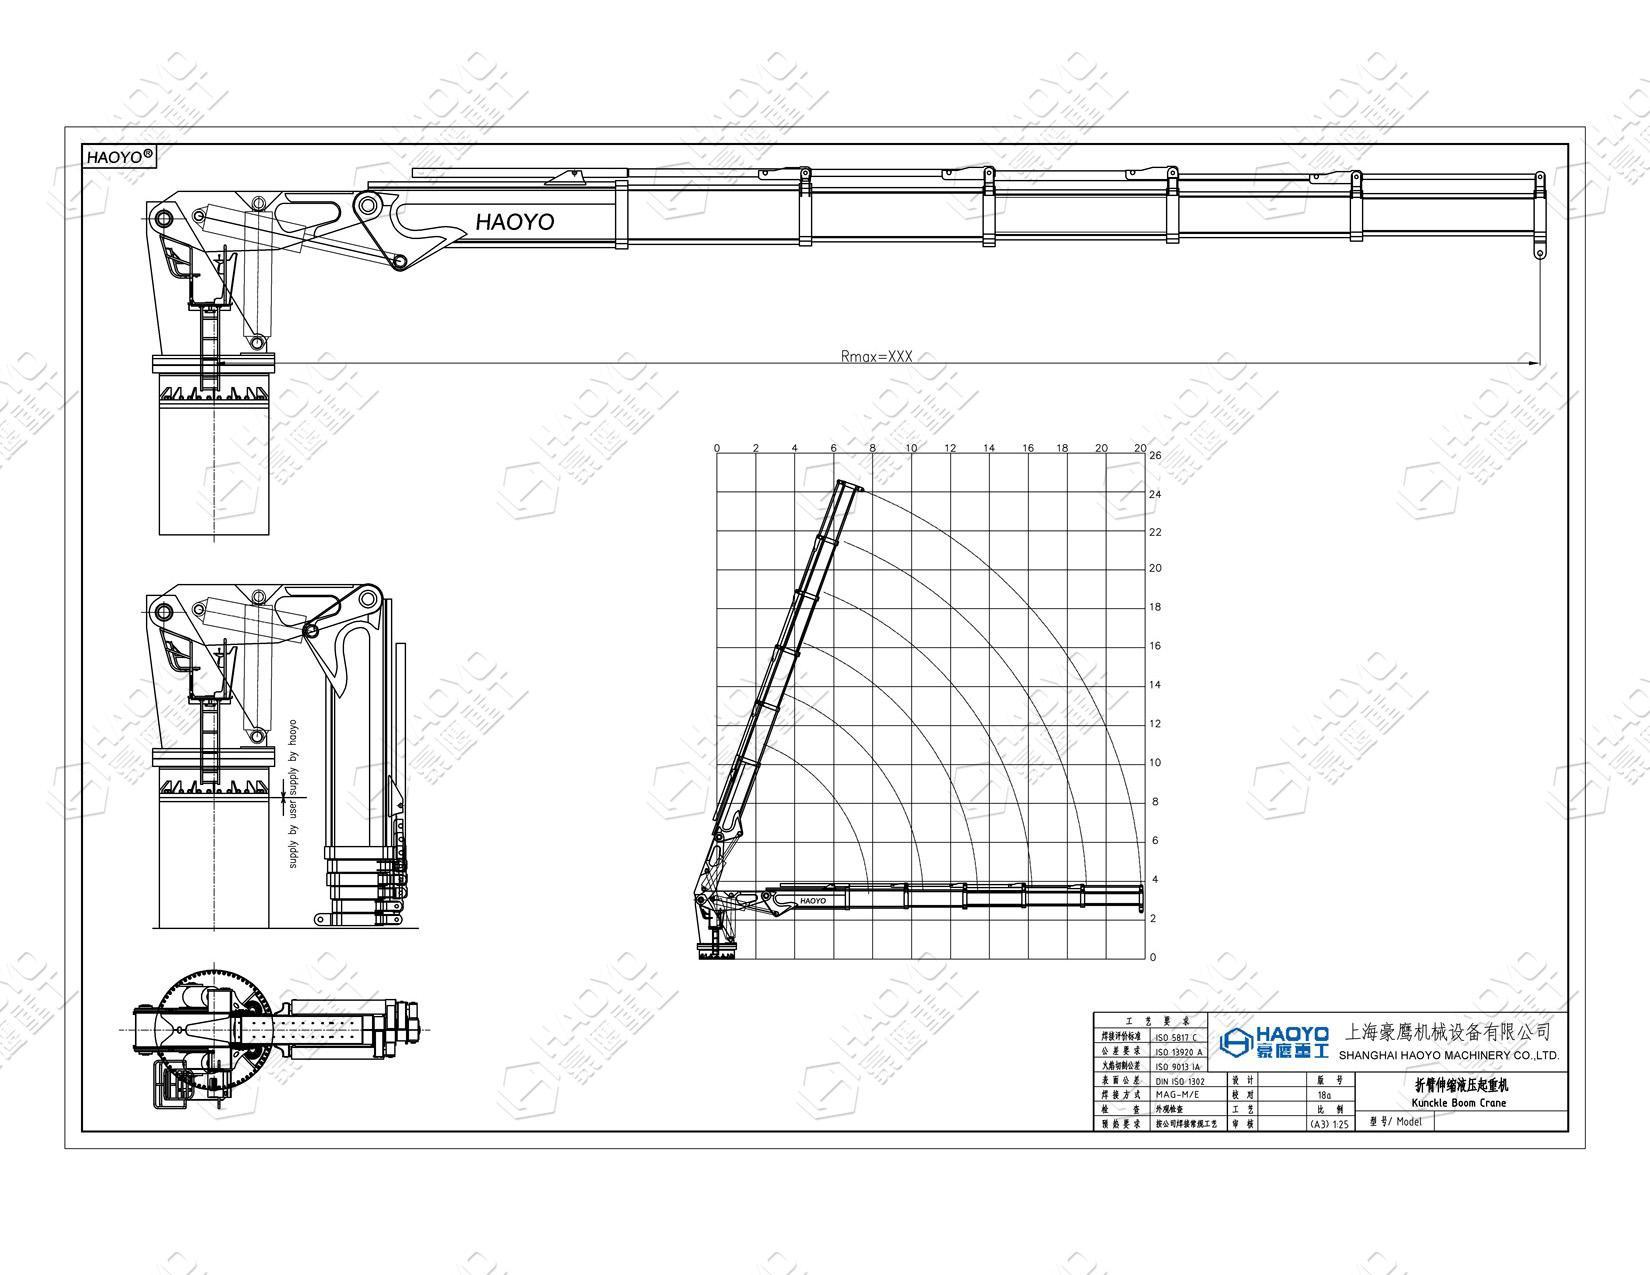 Knuckle Boom Pedestal Marine Crane in China  4